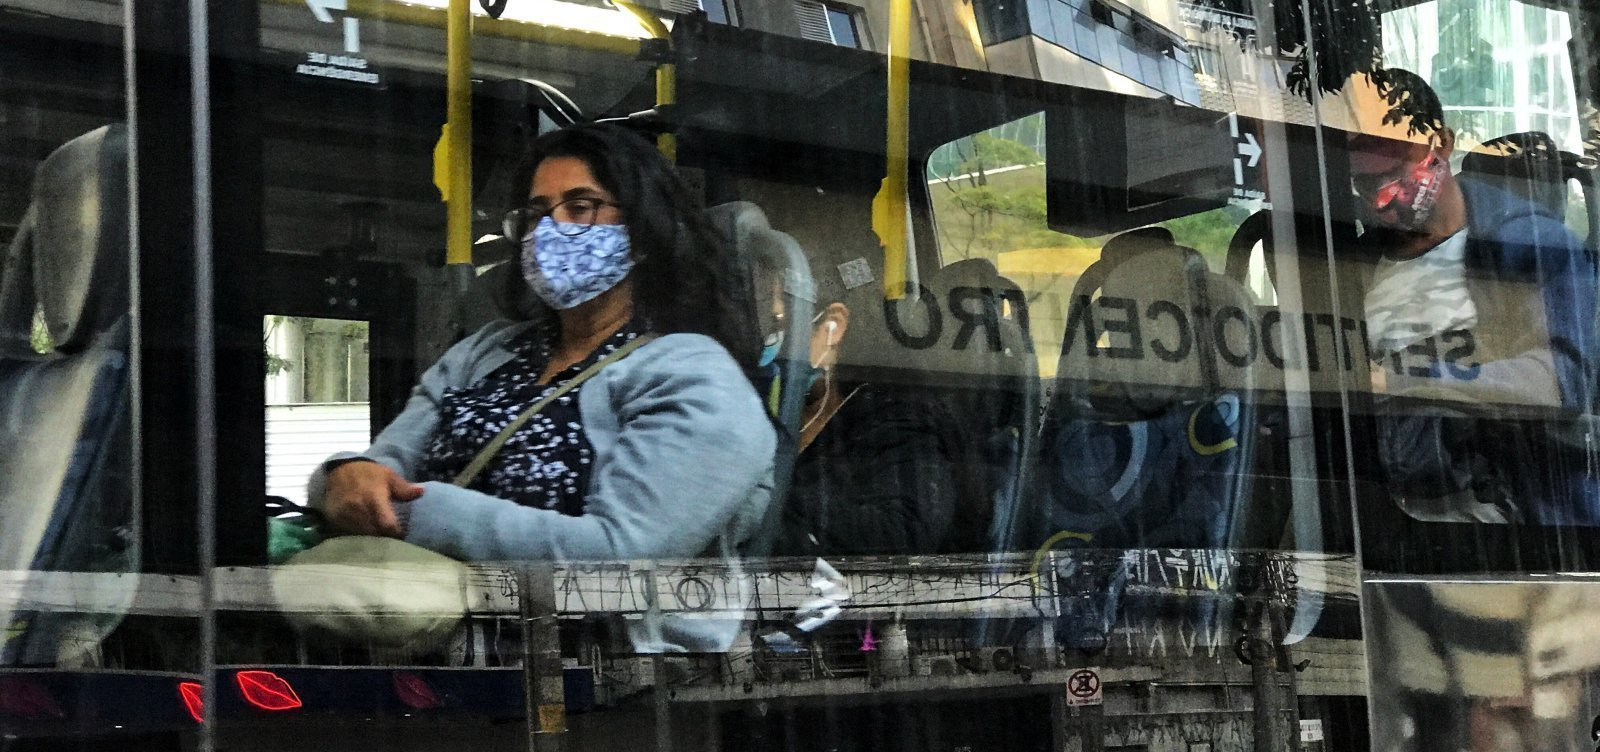 [América Latina ultrapassa 800 mil mortes pela covid]